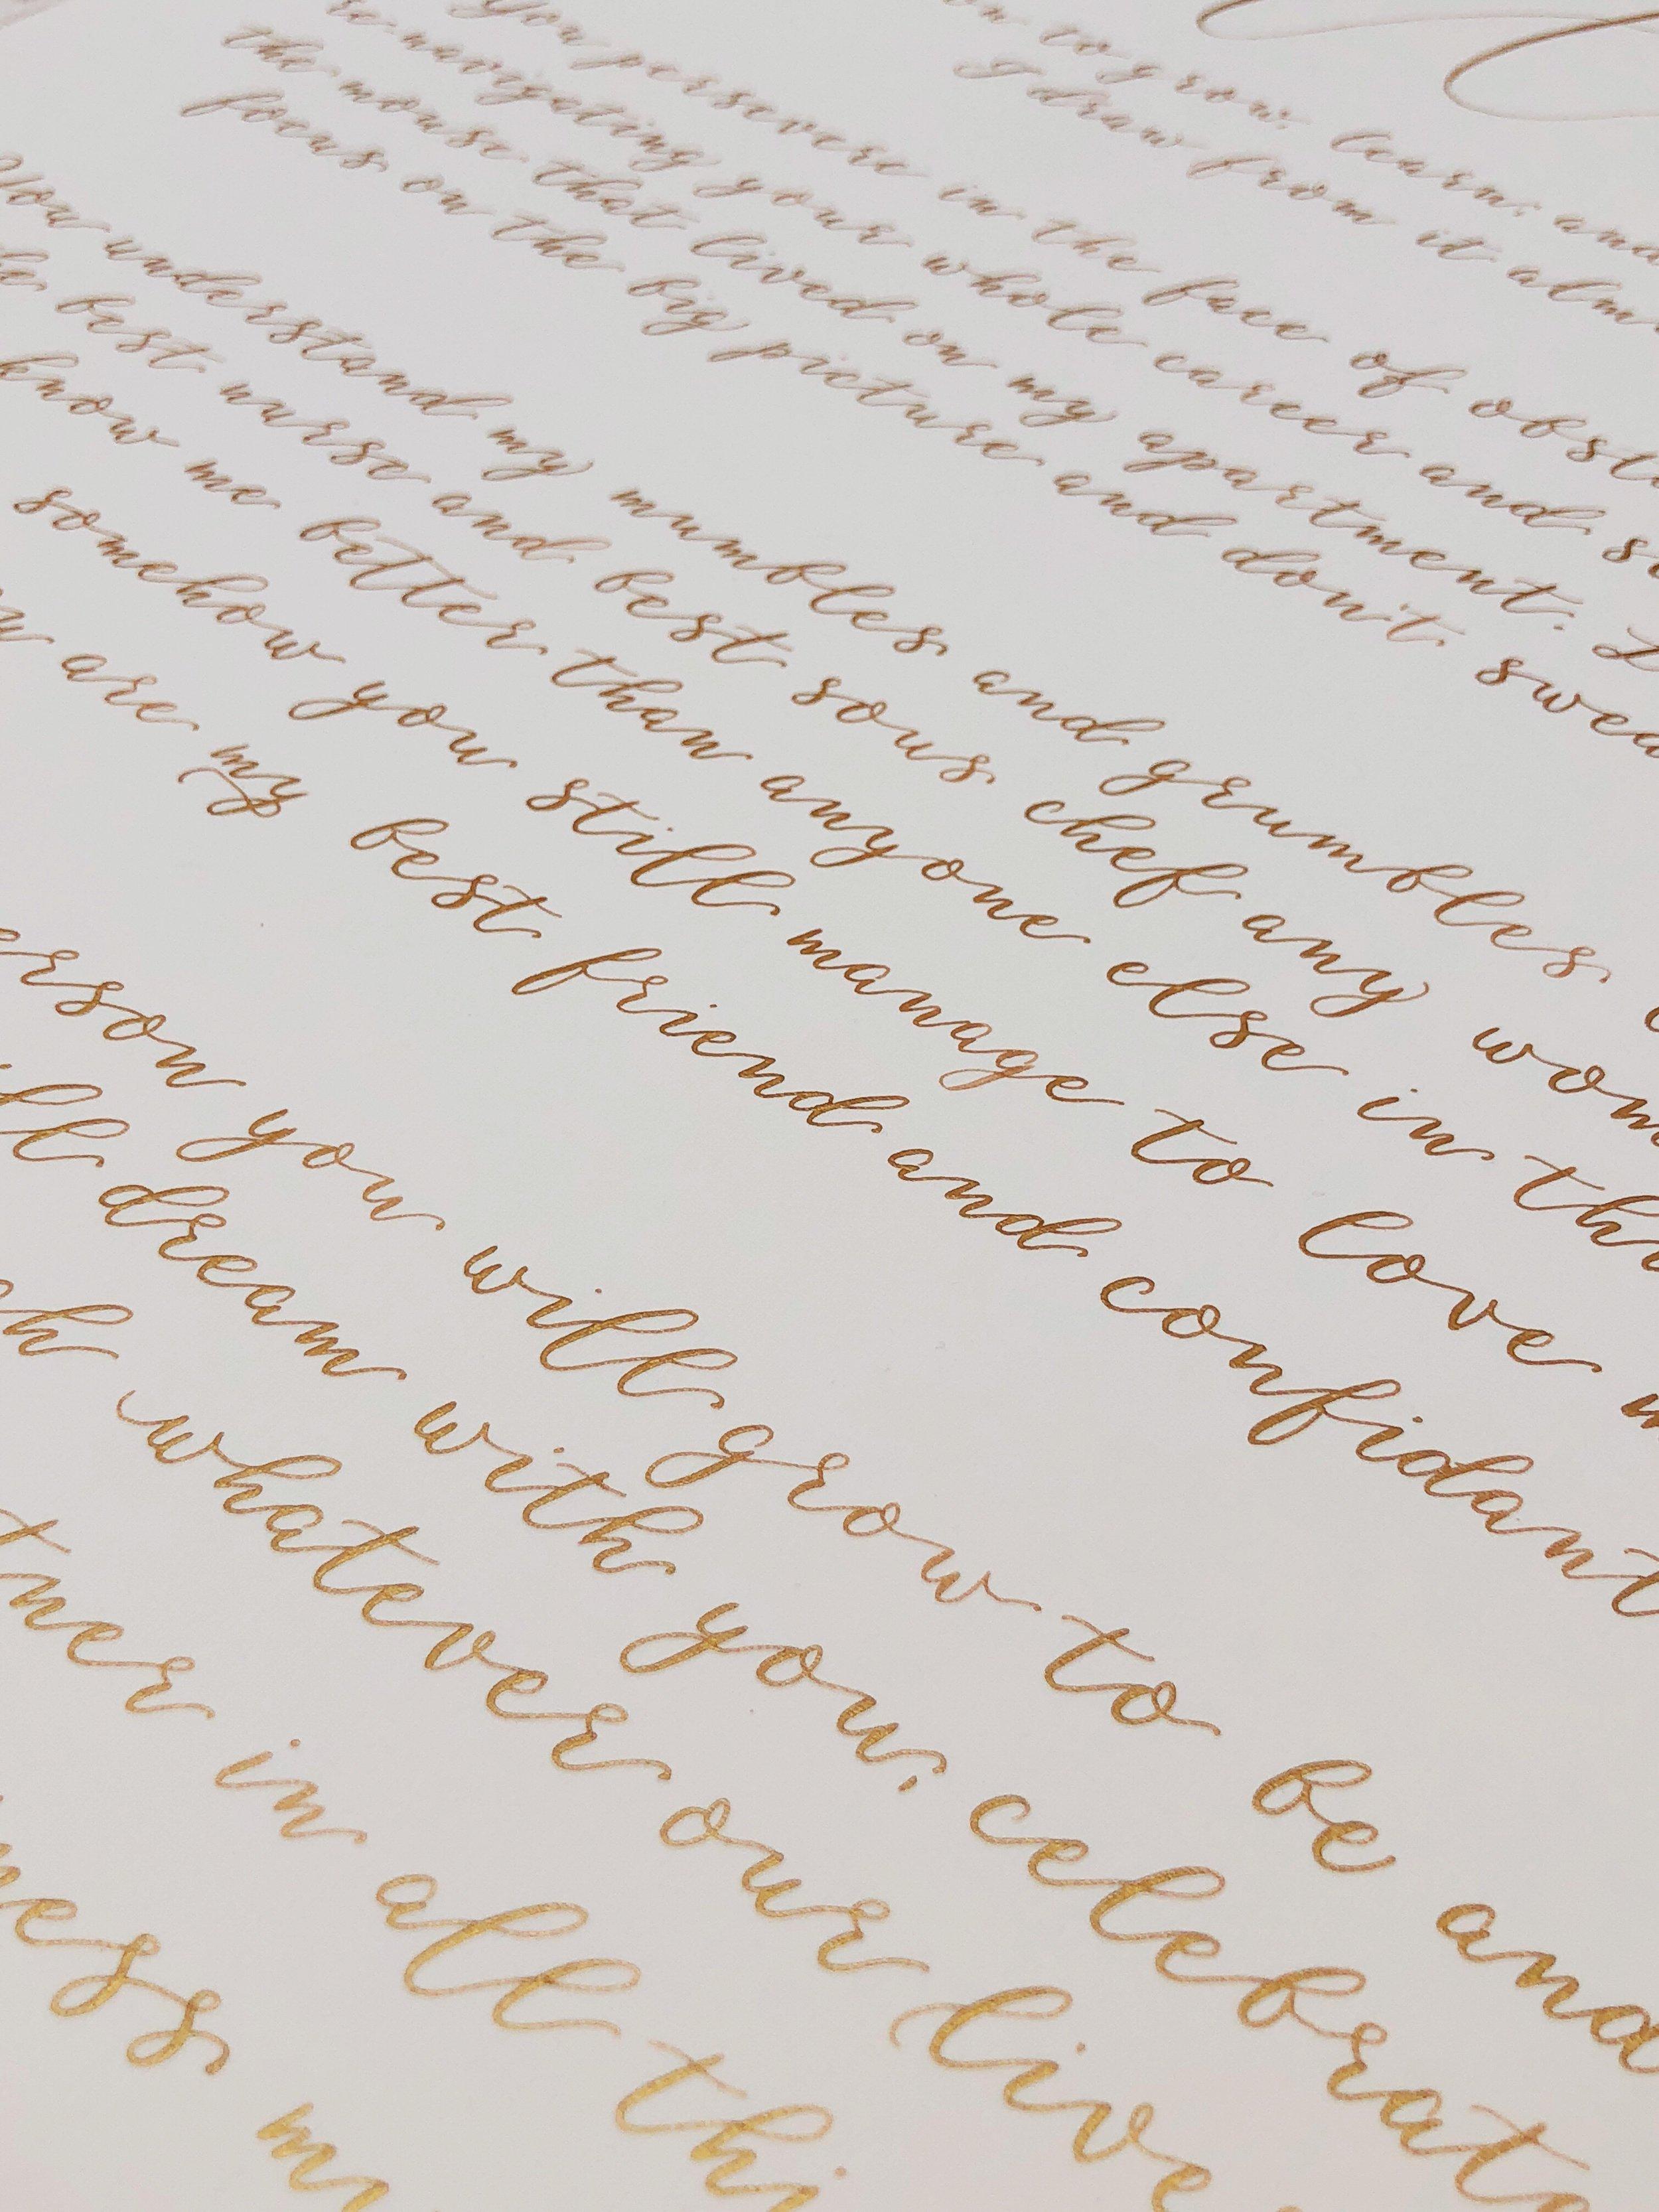 Central PA, York PA, JesSmith Designs, custom, wedding, invitations, bridal, Harrisburg, hanover, calligraphy, baltimore, wedding invitations, lancaster, gettysburg, 06-17 07.59.42.jpg